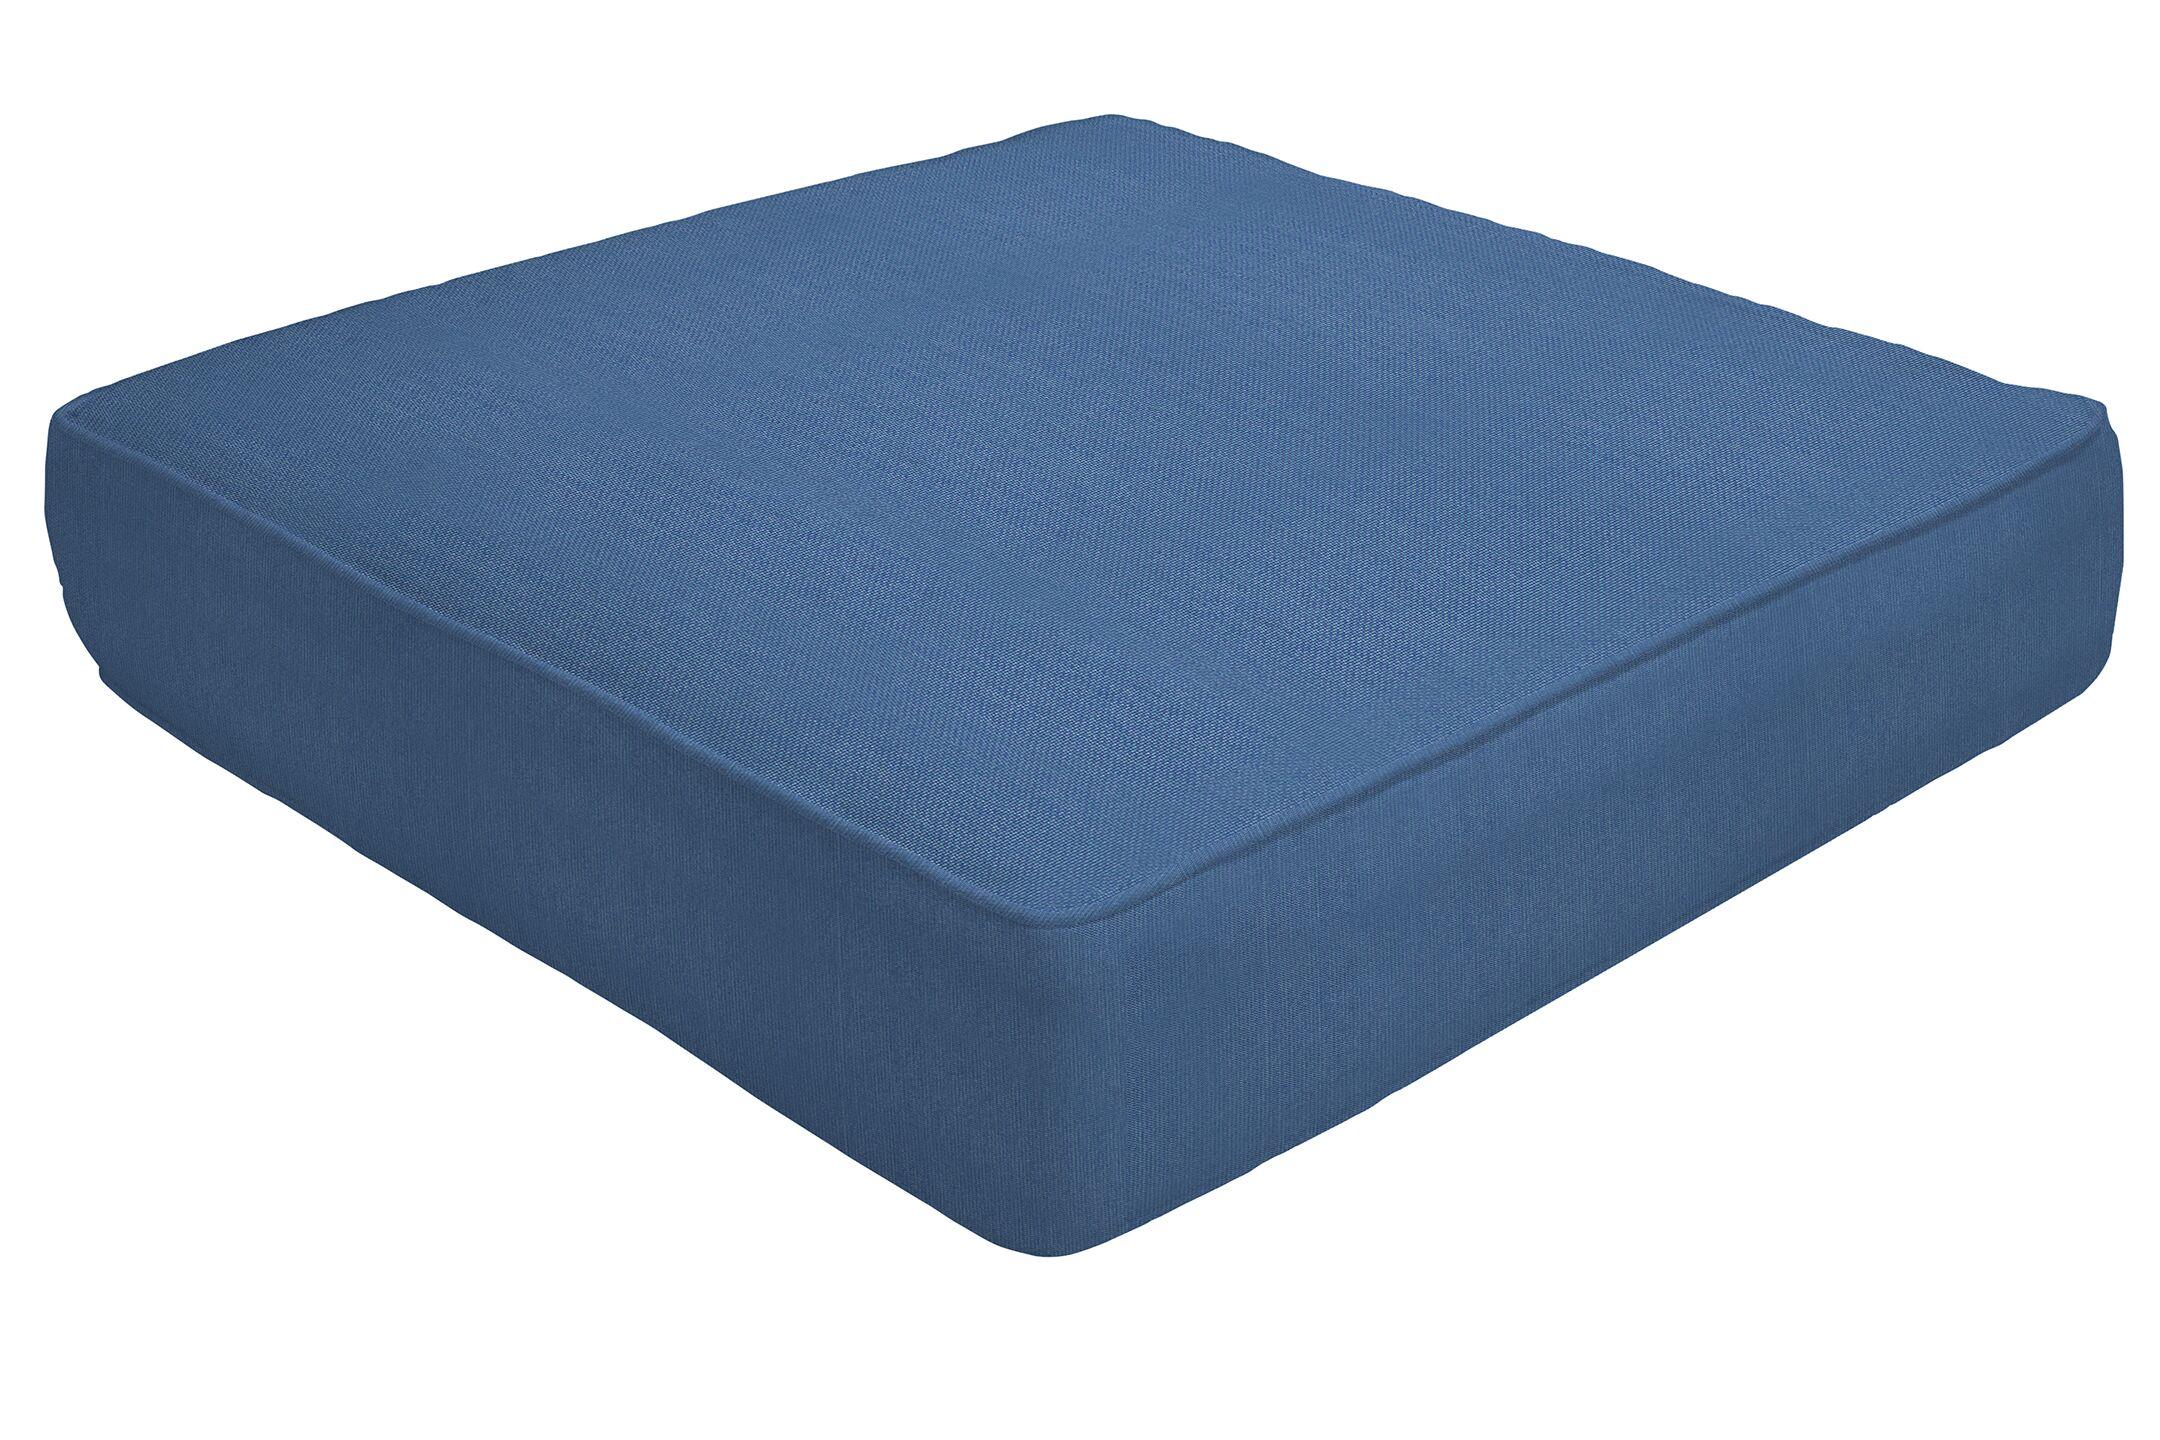 Double Piped Indoor/Outdoor Sunbrella Ottoman Cushion Fabric: Regatta, Size: 5